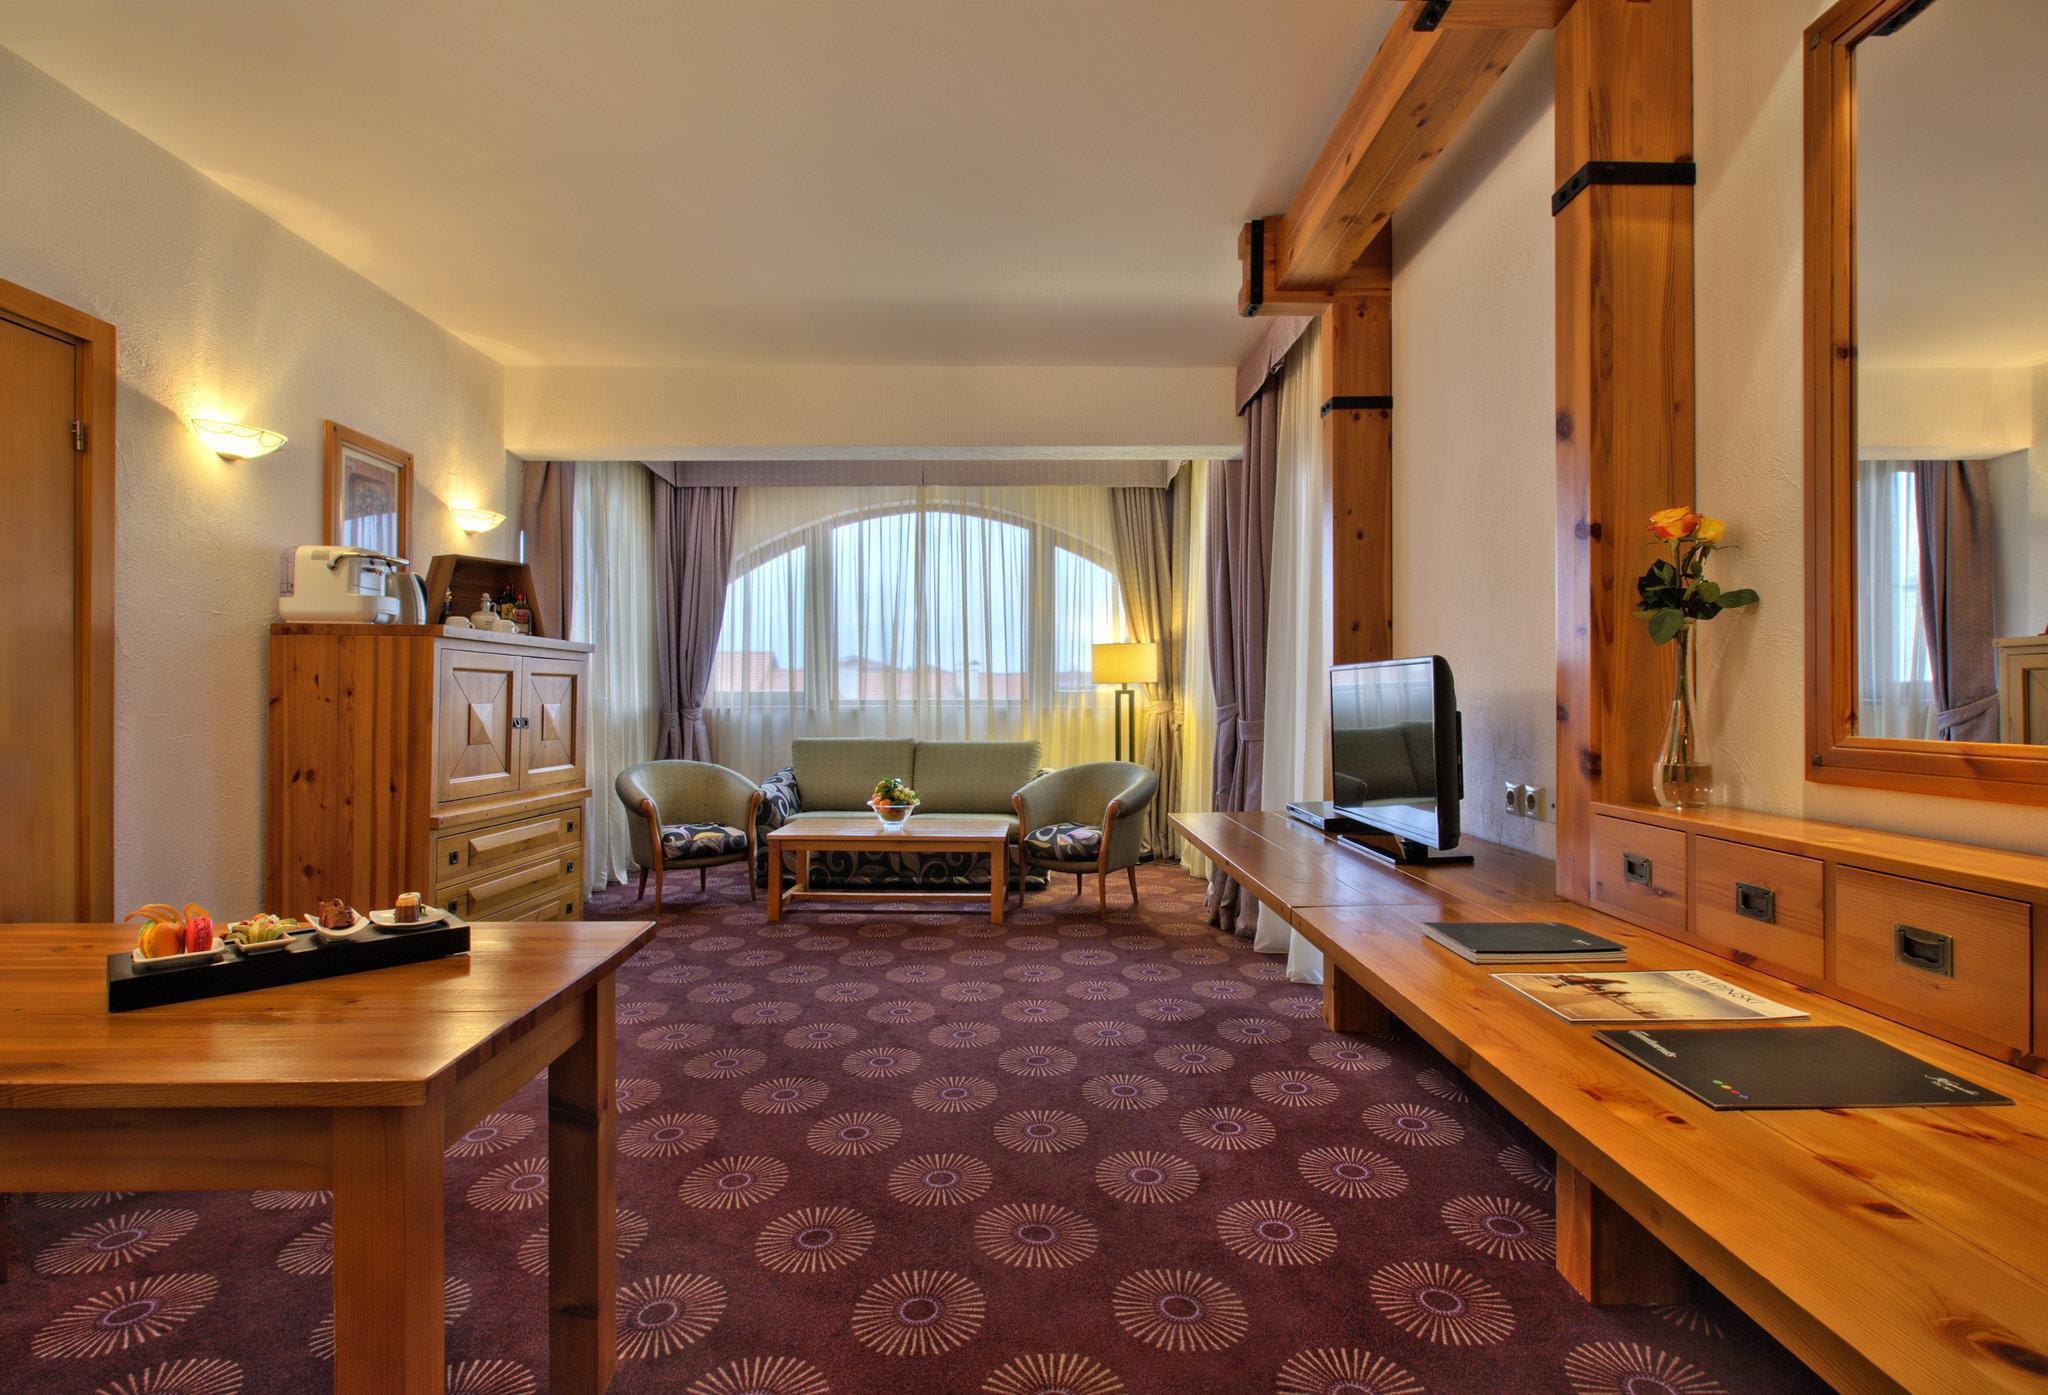 班 斯 克 本 斯 克 大 竞 技 场 凯 宾 斯 基 酒 店 (Kempinski Hotel Grand Arena